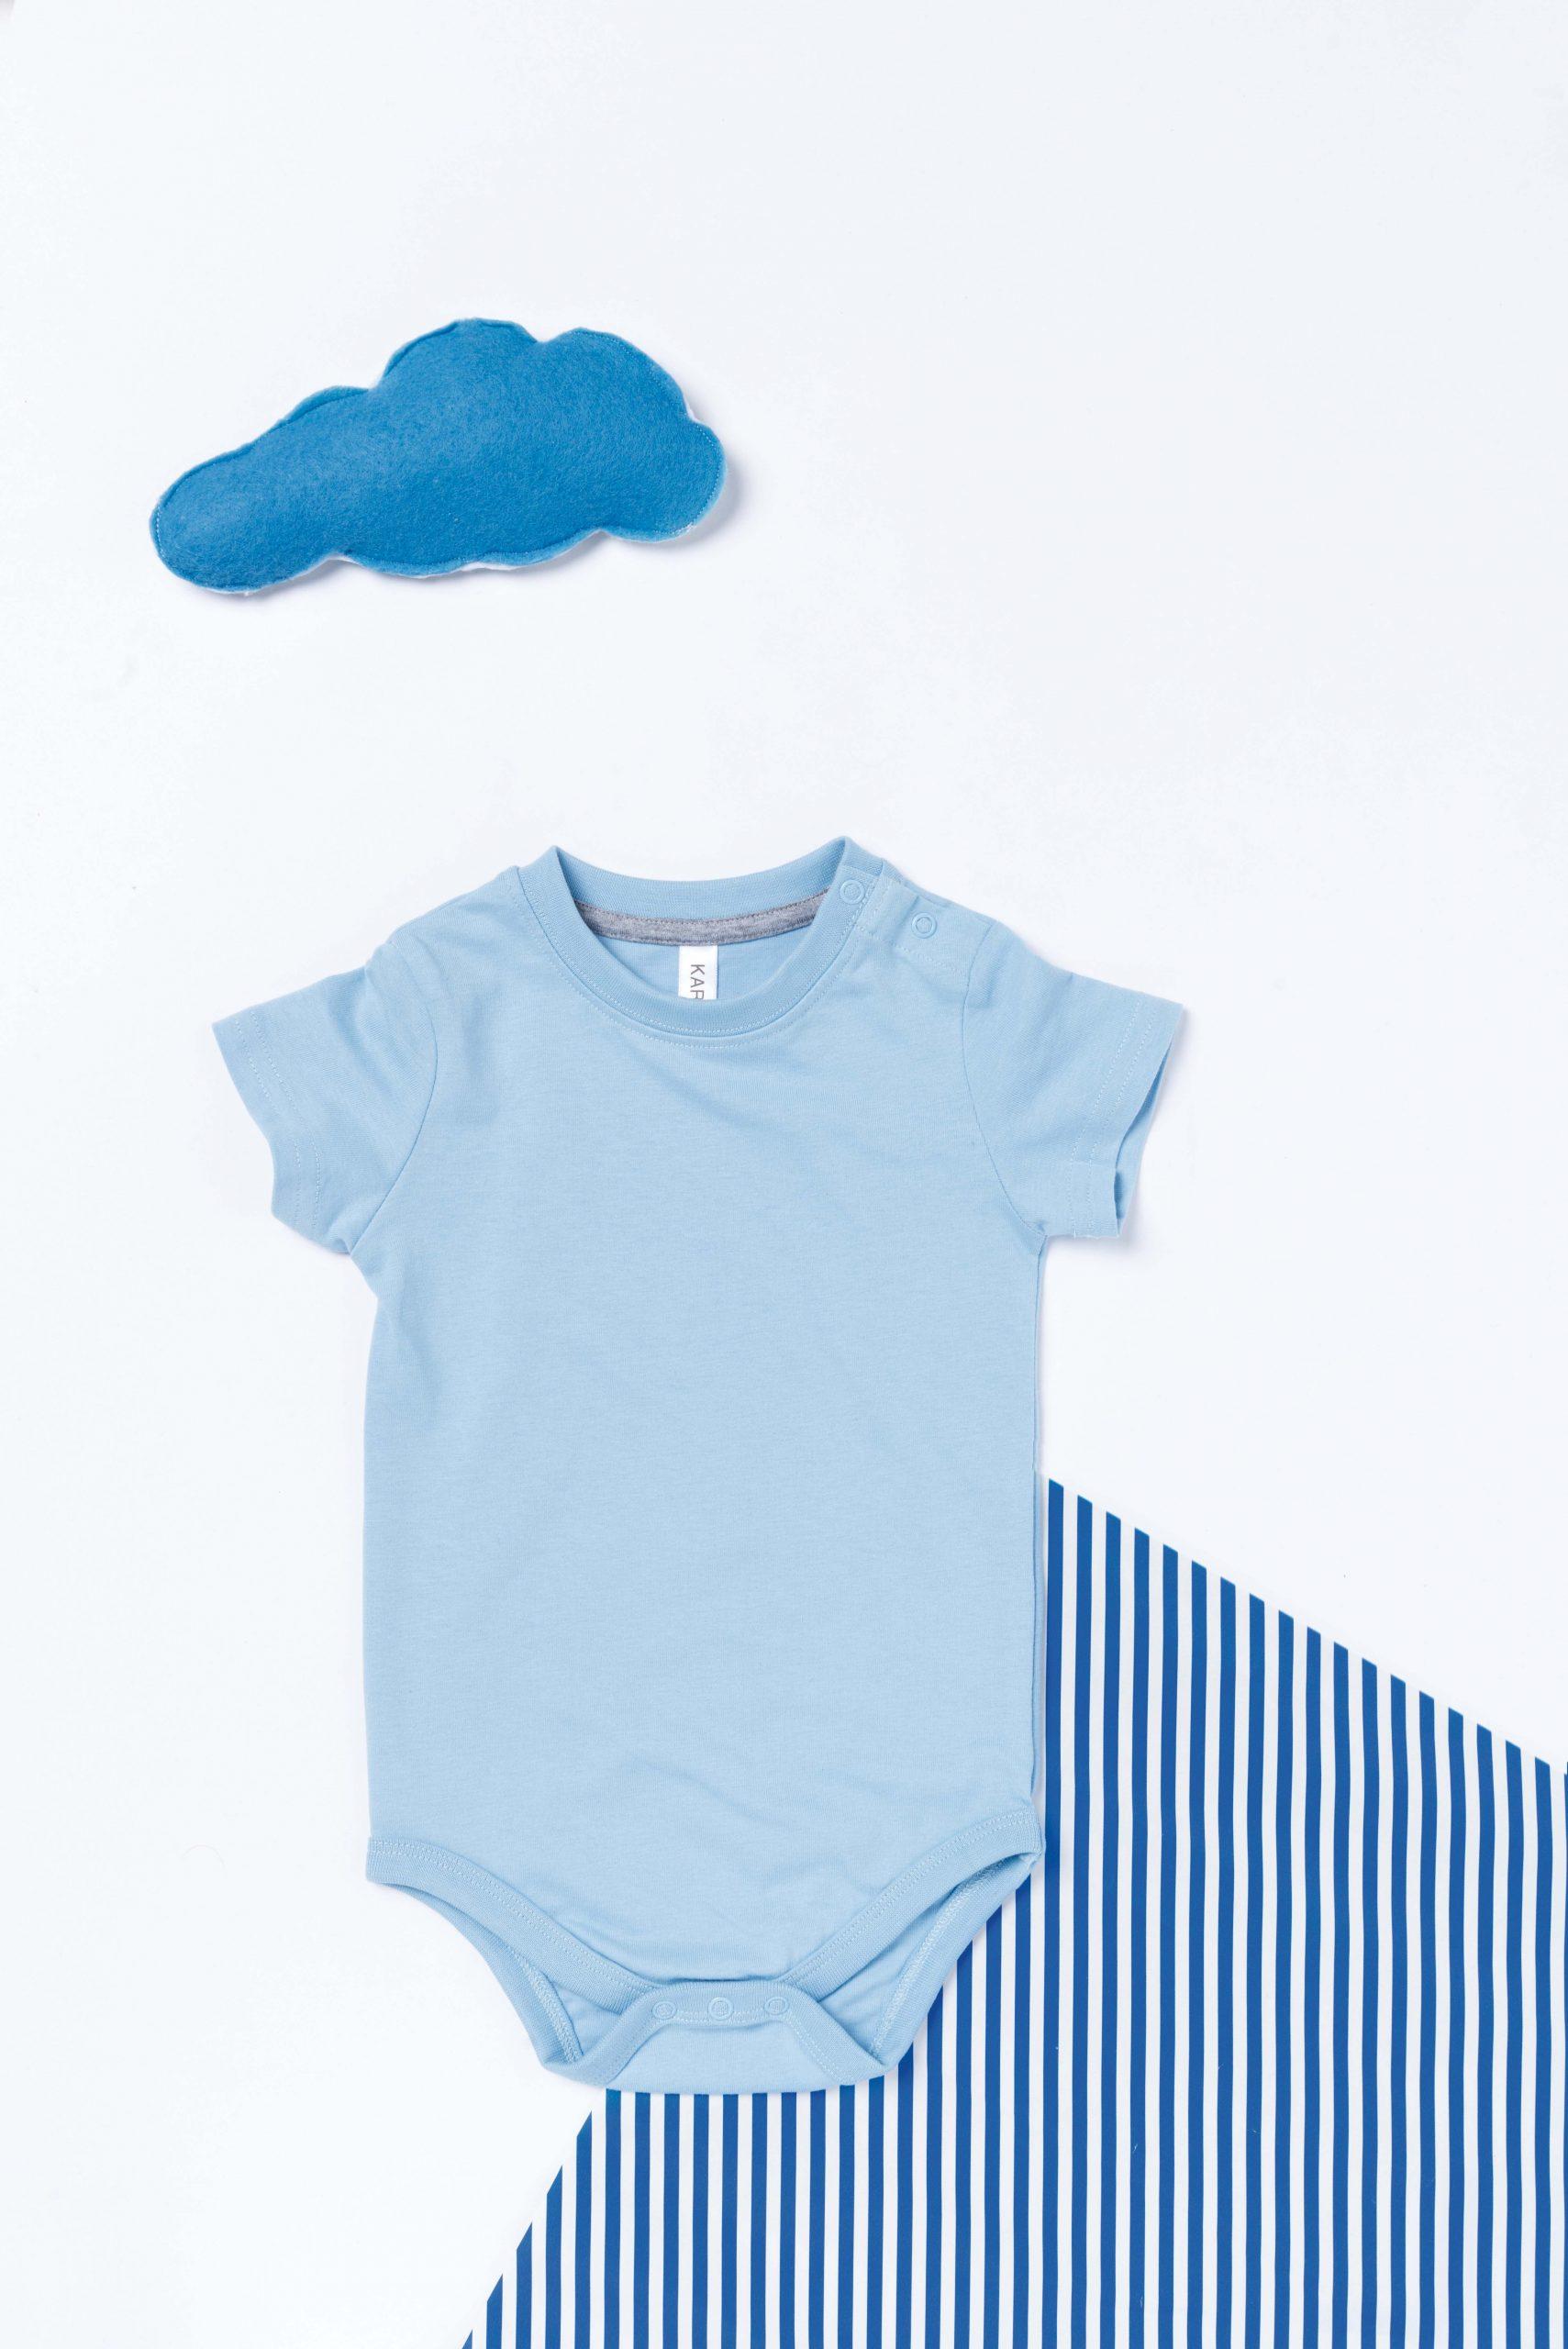 Short Sleeves Bodysuit Baby